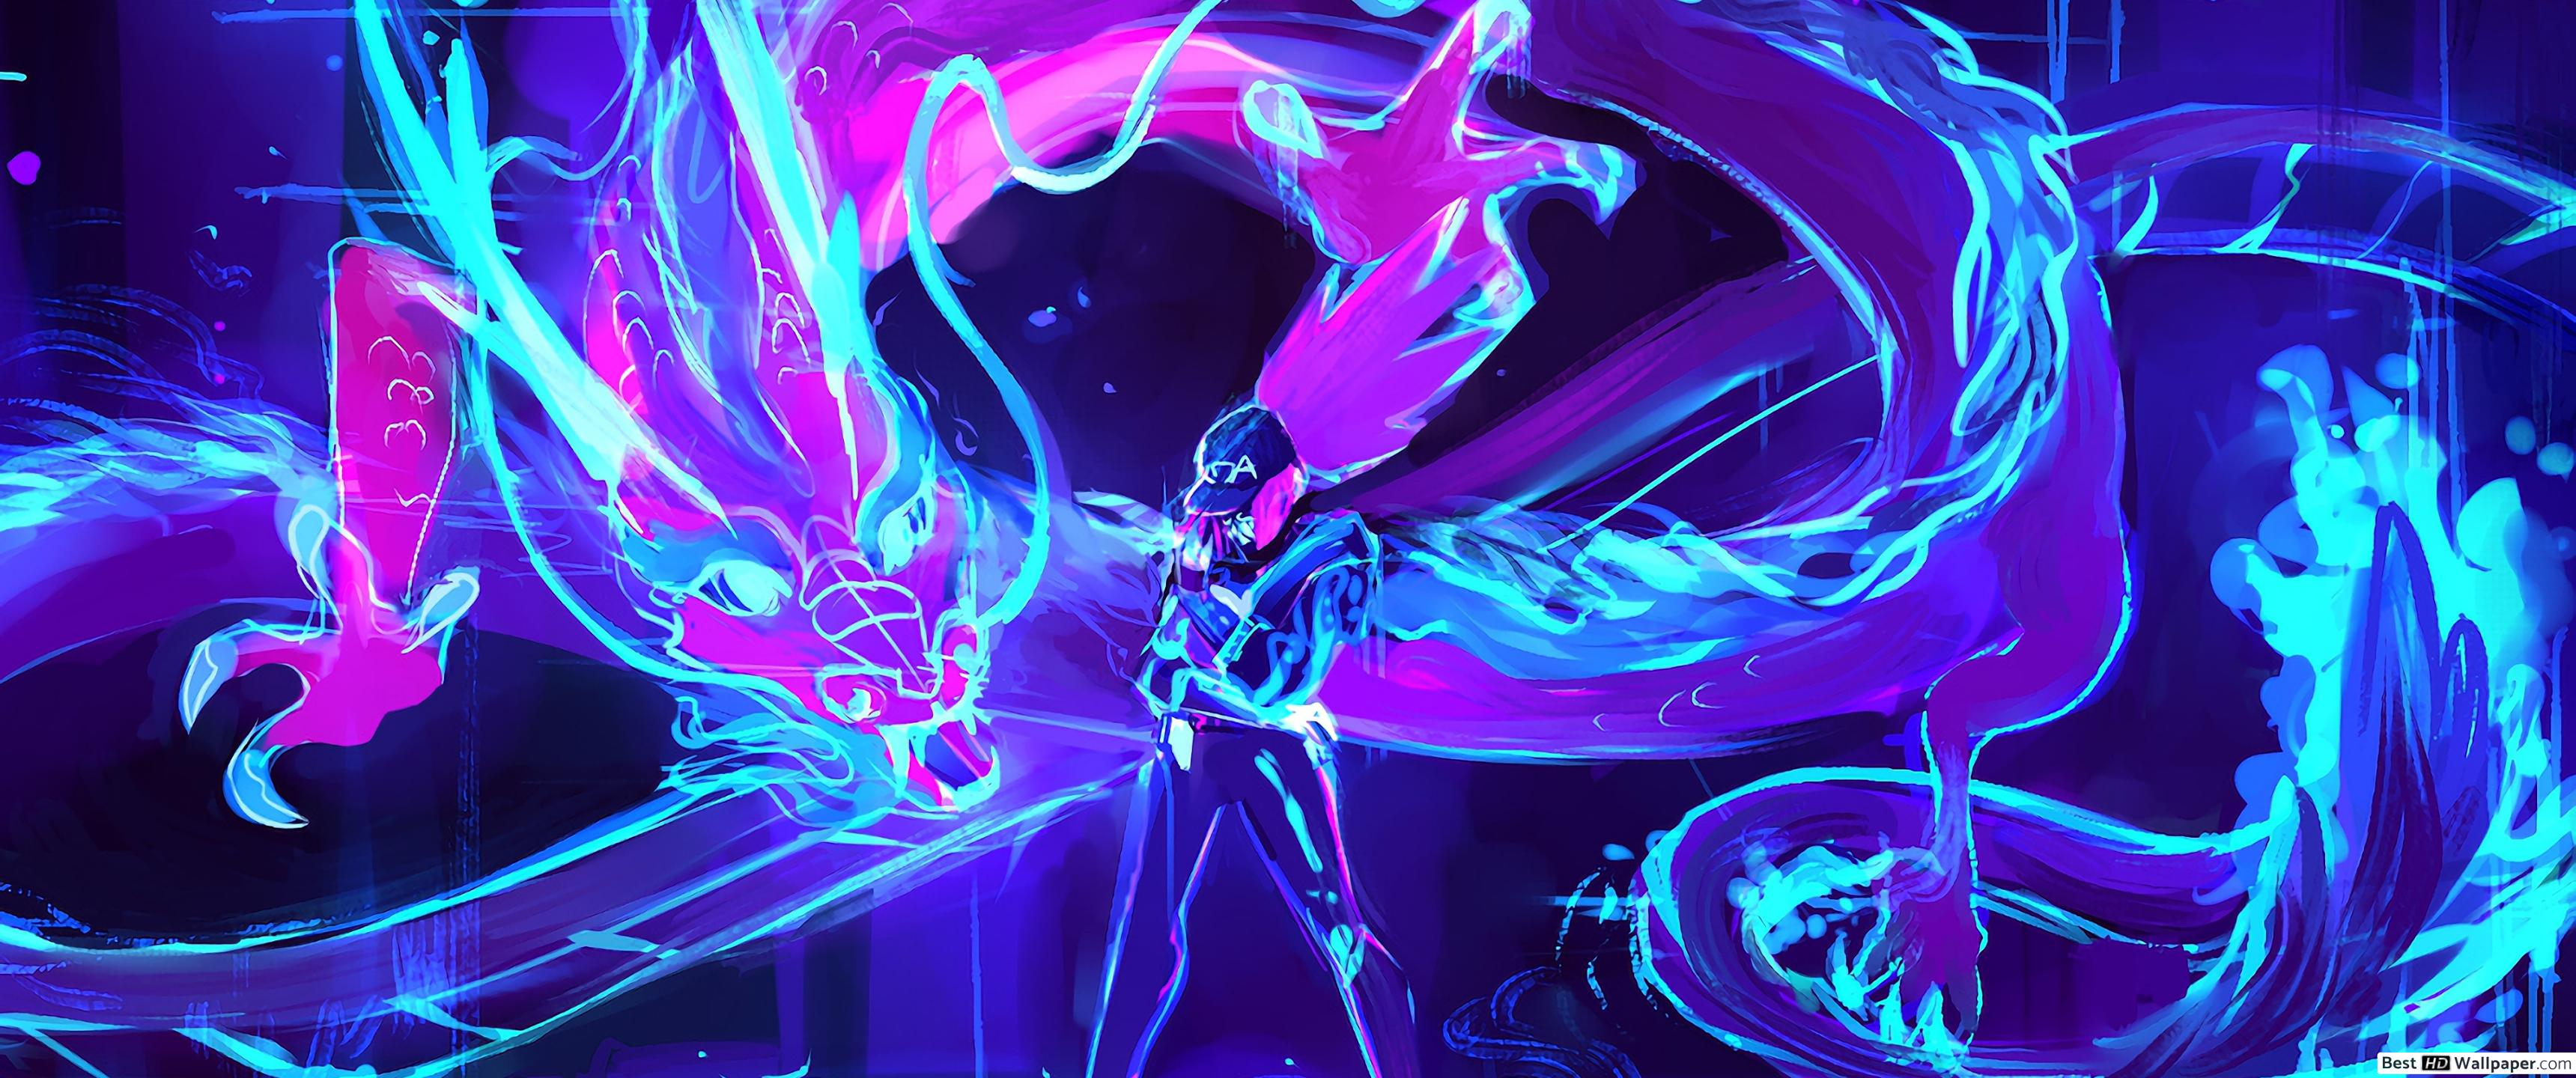 Gaming Neon Wallpapers - Wallpaper Cave